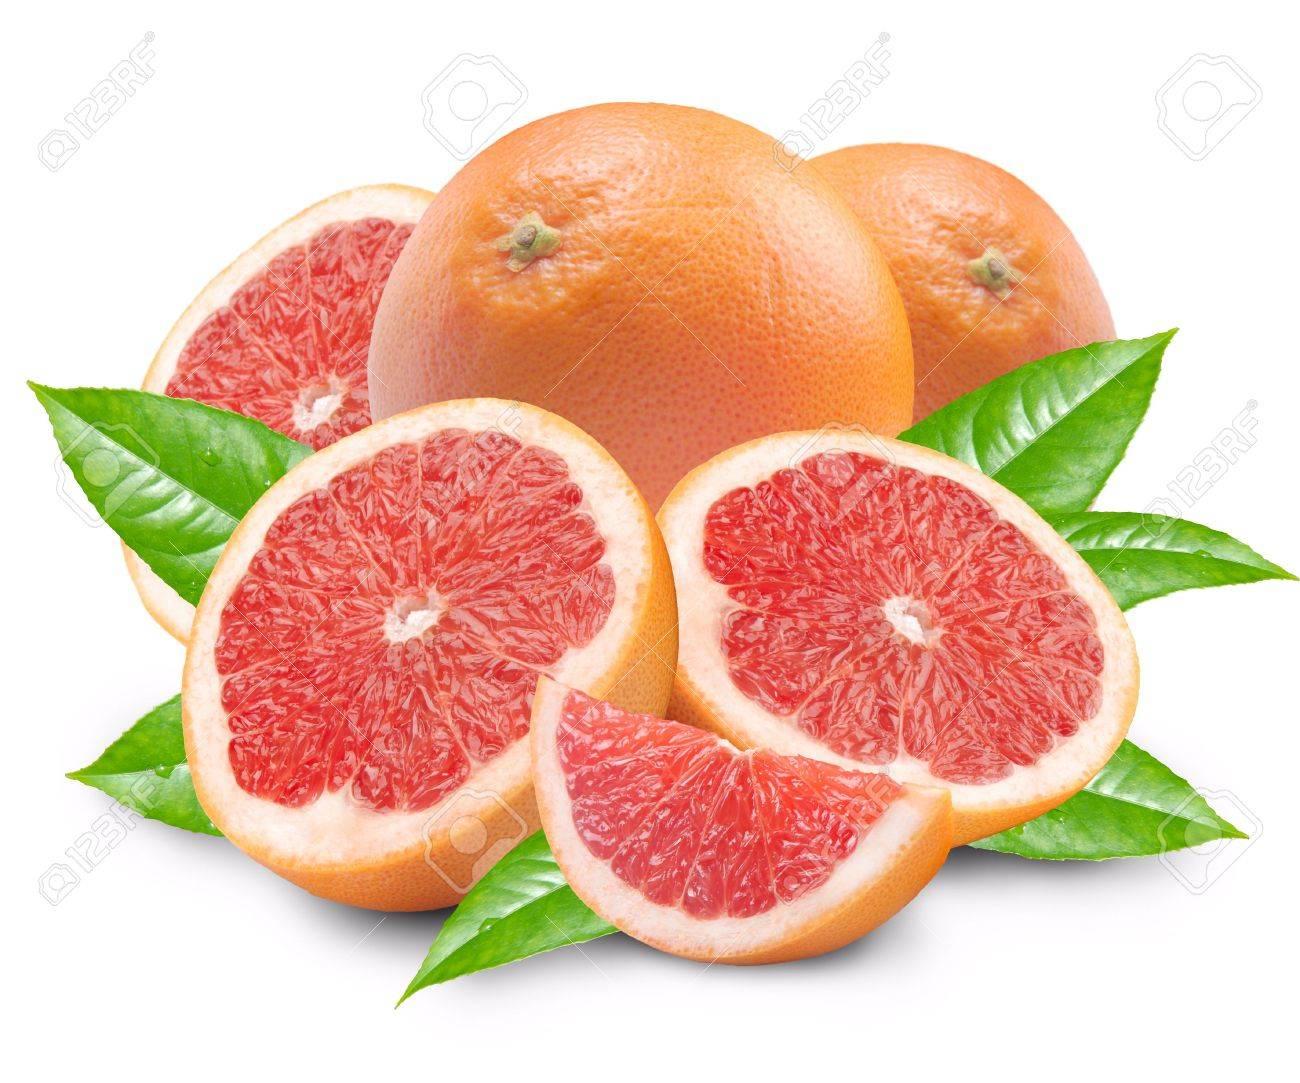 Grapefruit with segments on a white background Stock Photo - 5885871